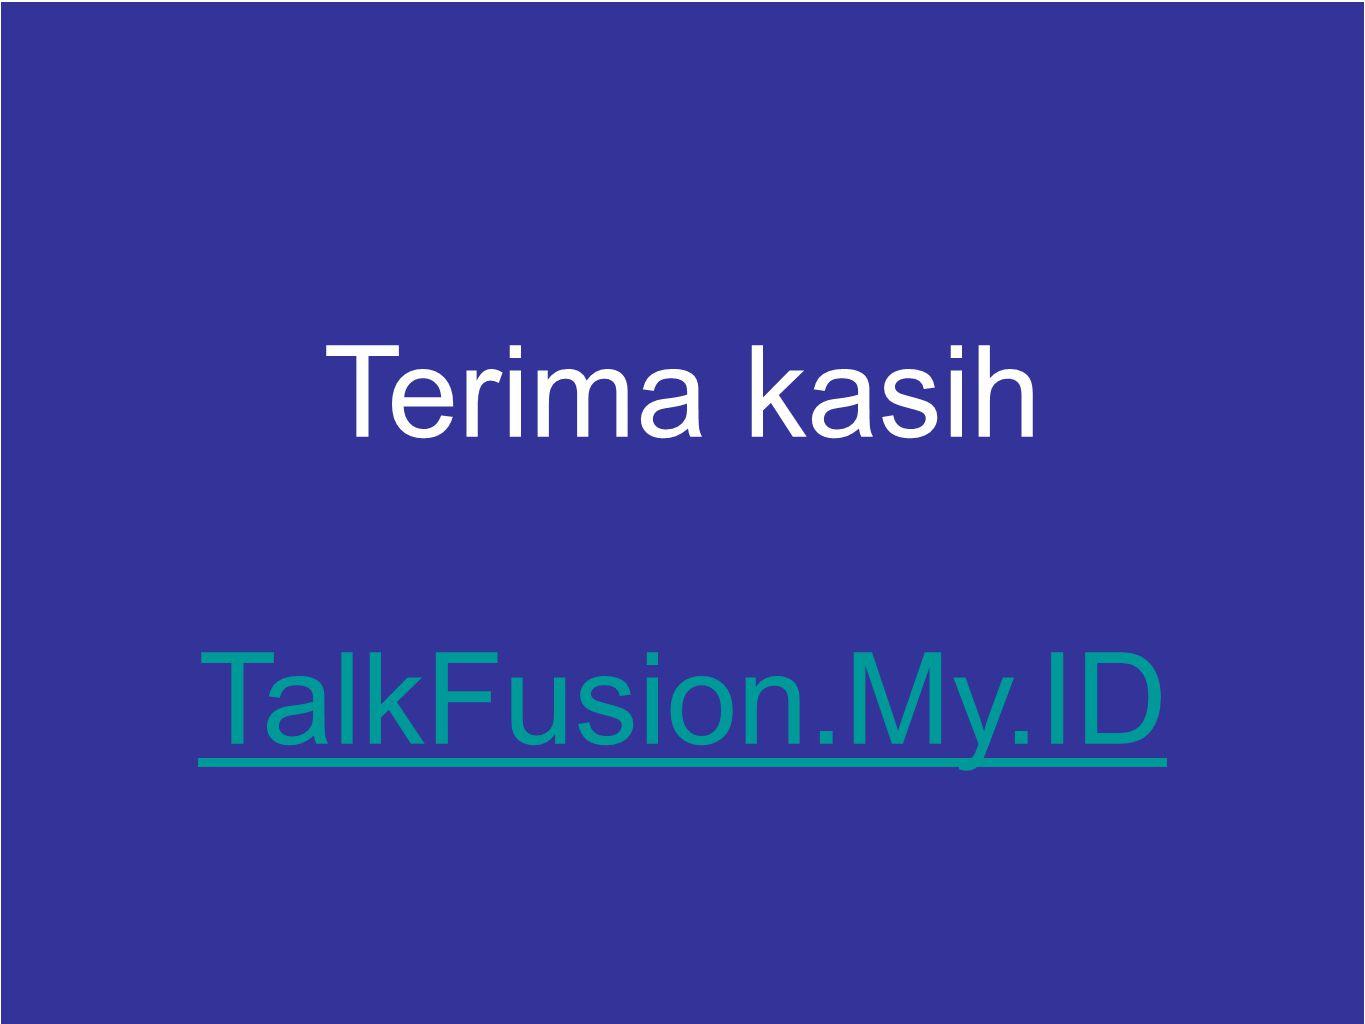 Terima kasih TalkFusion.My.ID